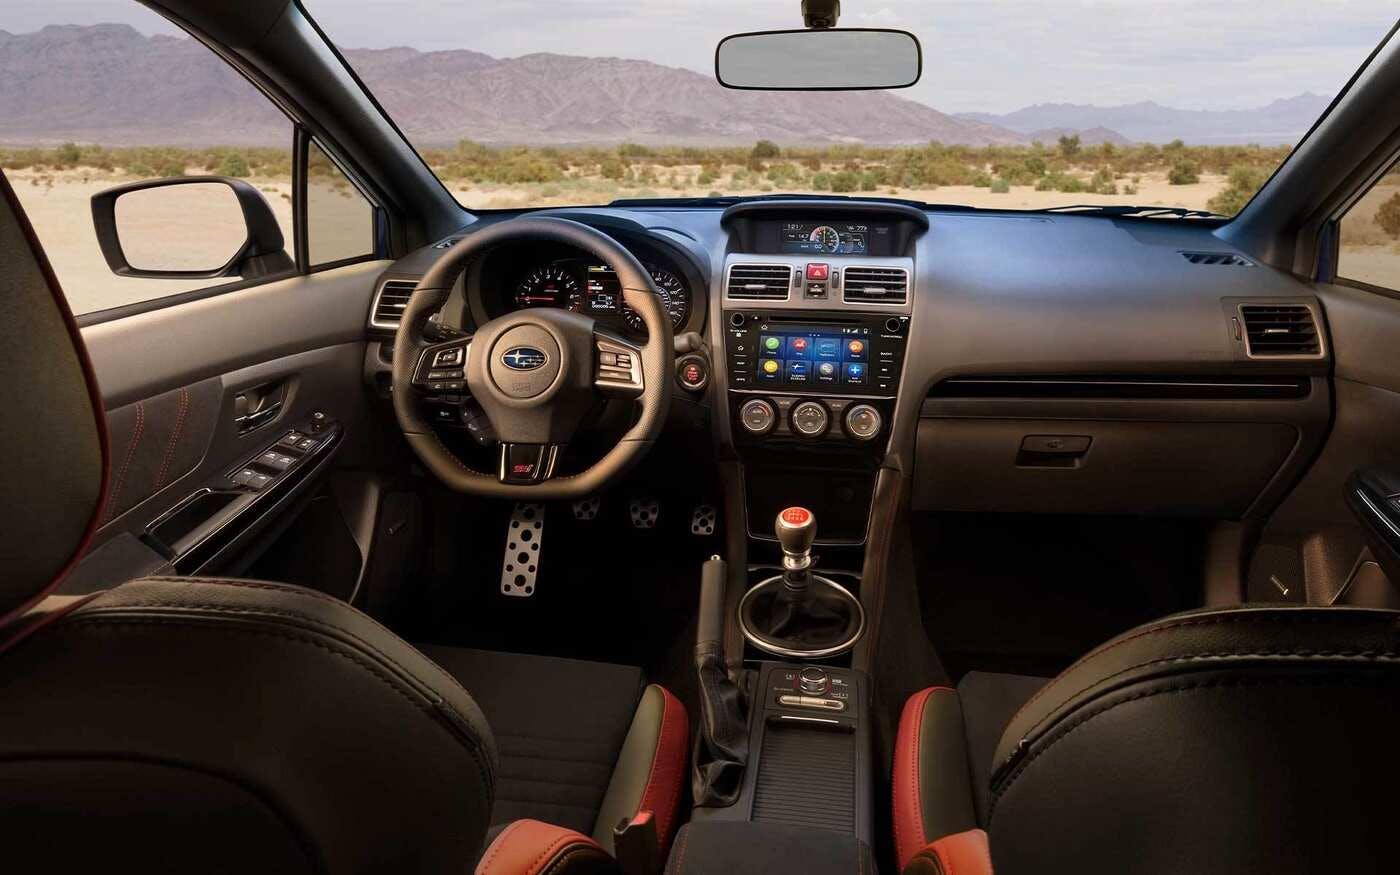 2020 Subaru Wrx Reviews Pricing Pictures Truecar